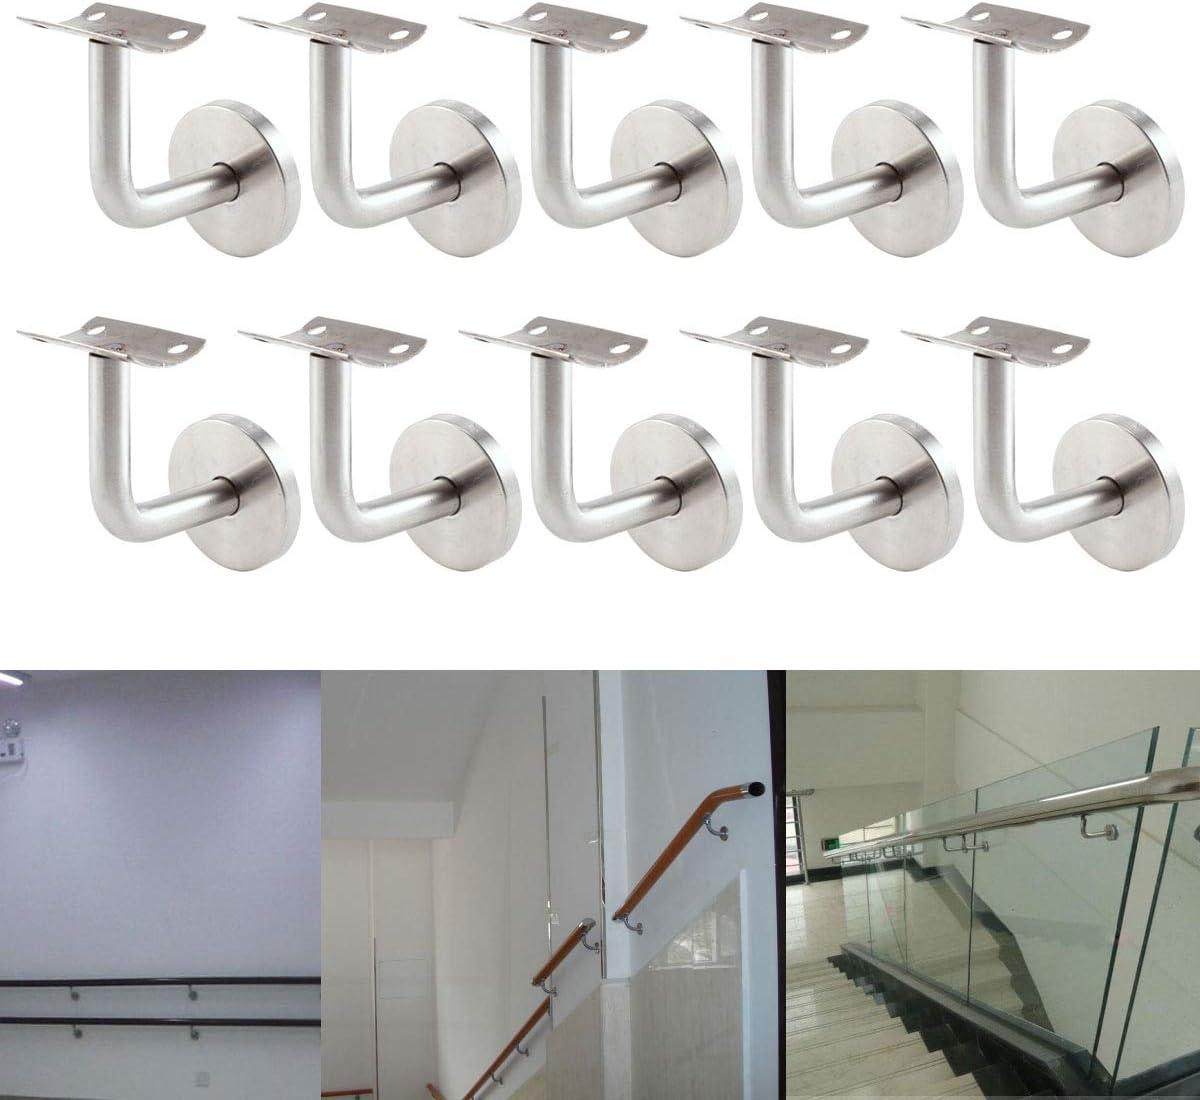 10 Set Handlauftr/äger Handlaufhalter Handlauf Wandhalter Holz Gel/änder Flach mit Abdeckrosette Edelstahl #201